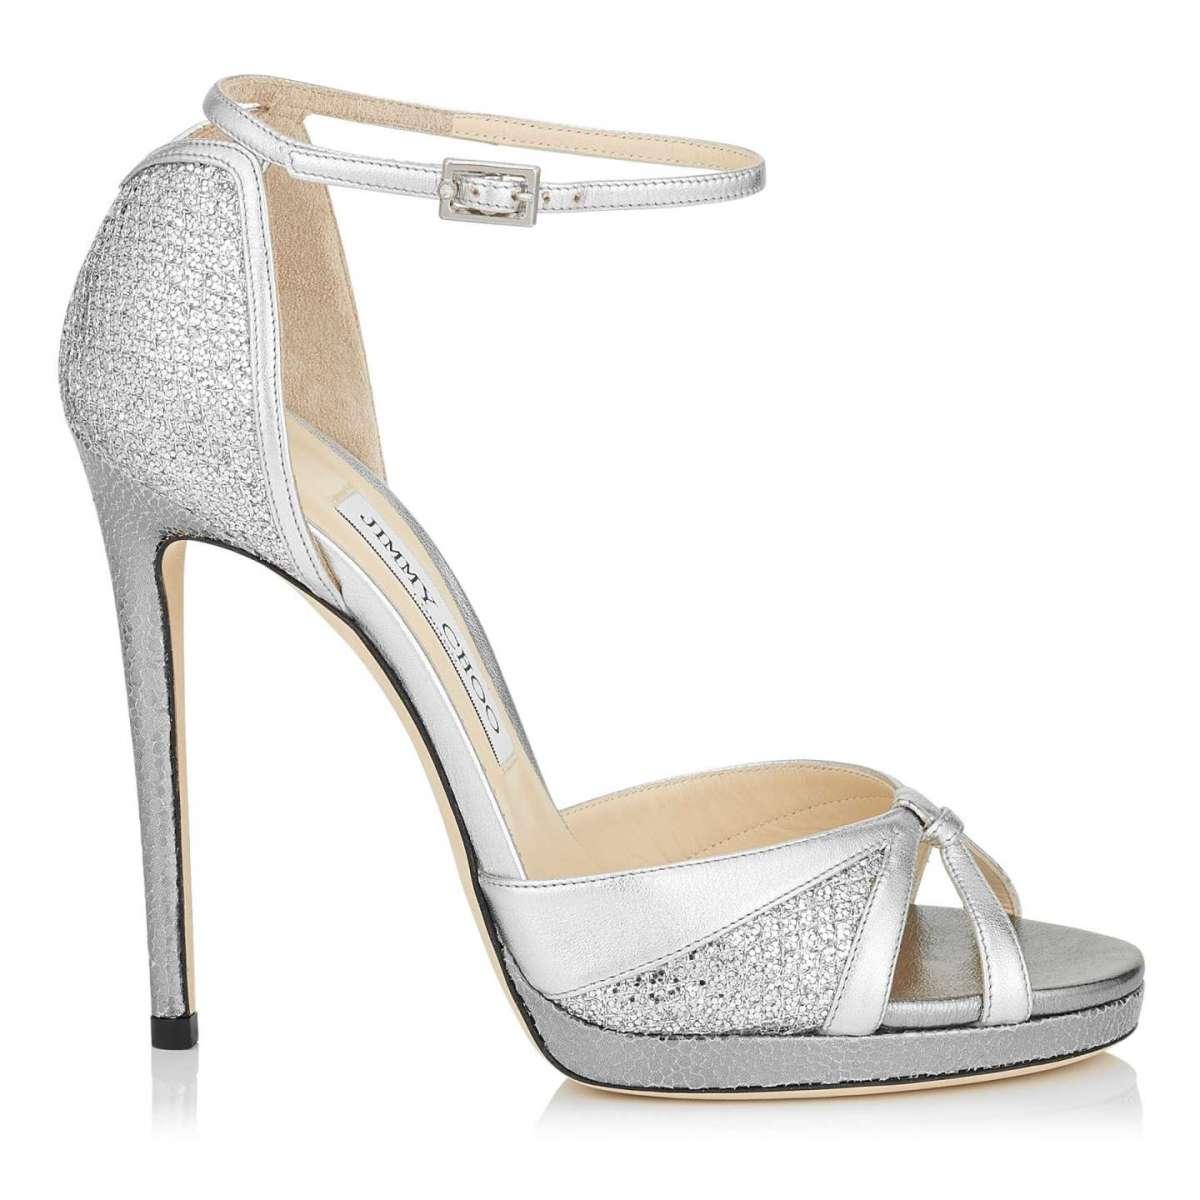 Sandali alti argento